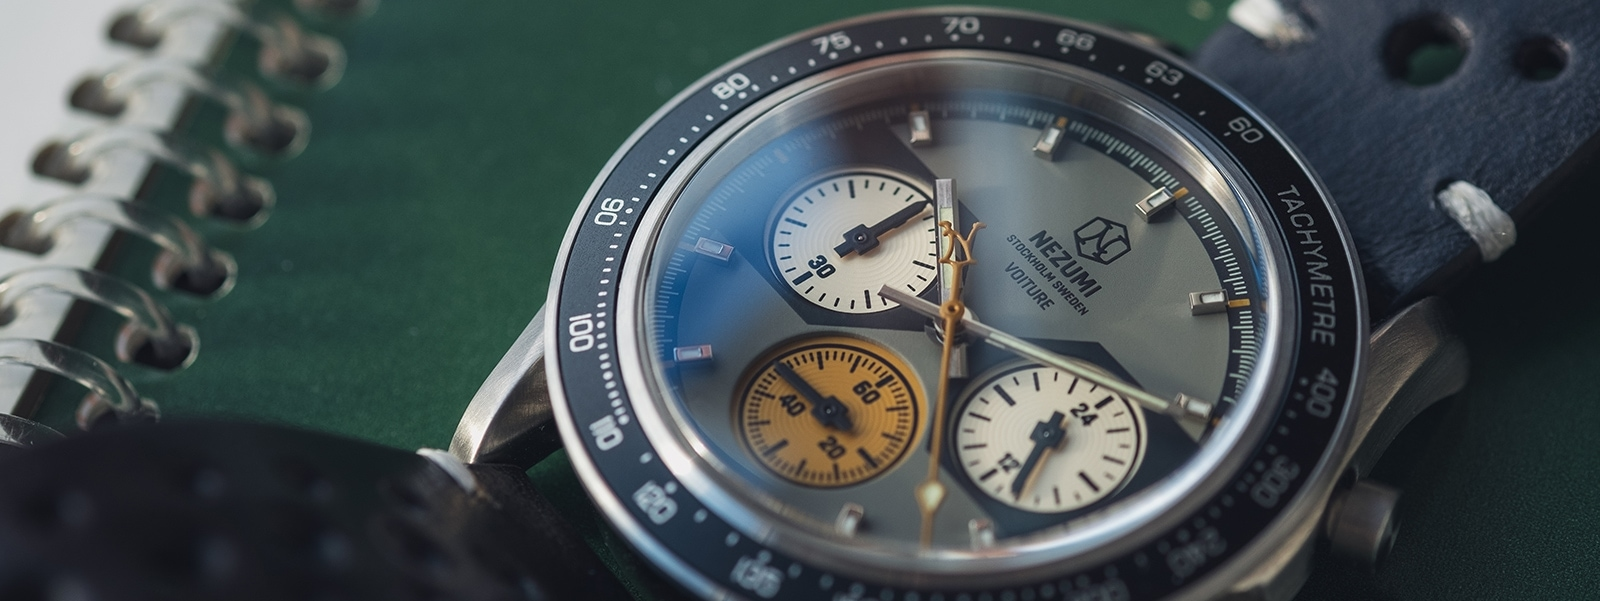 Voiture racing chronograph ref. VQ2. 702 watch by Nezumi Studios